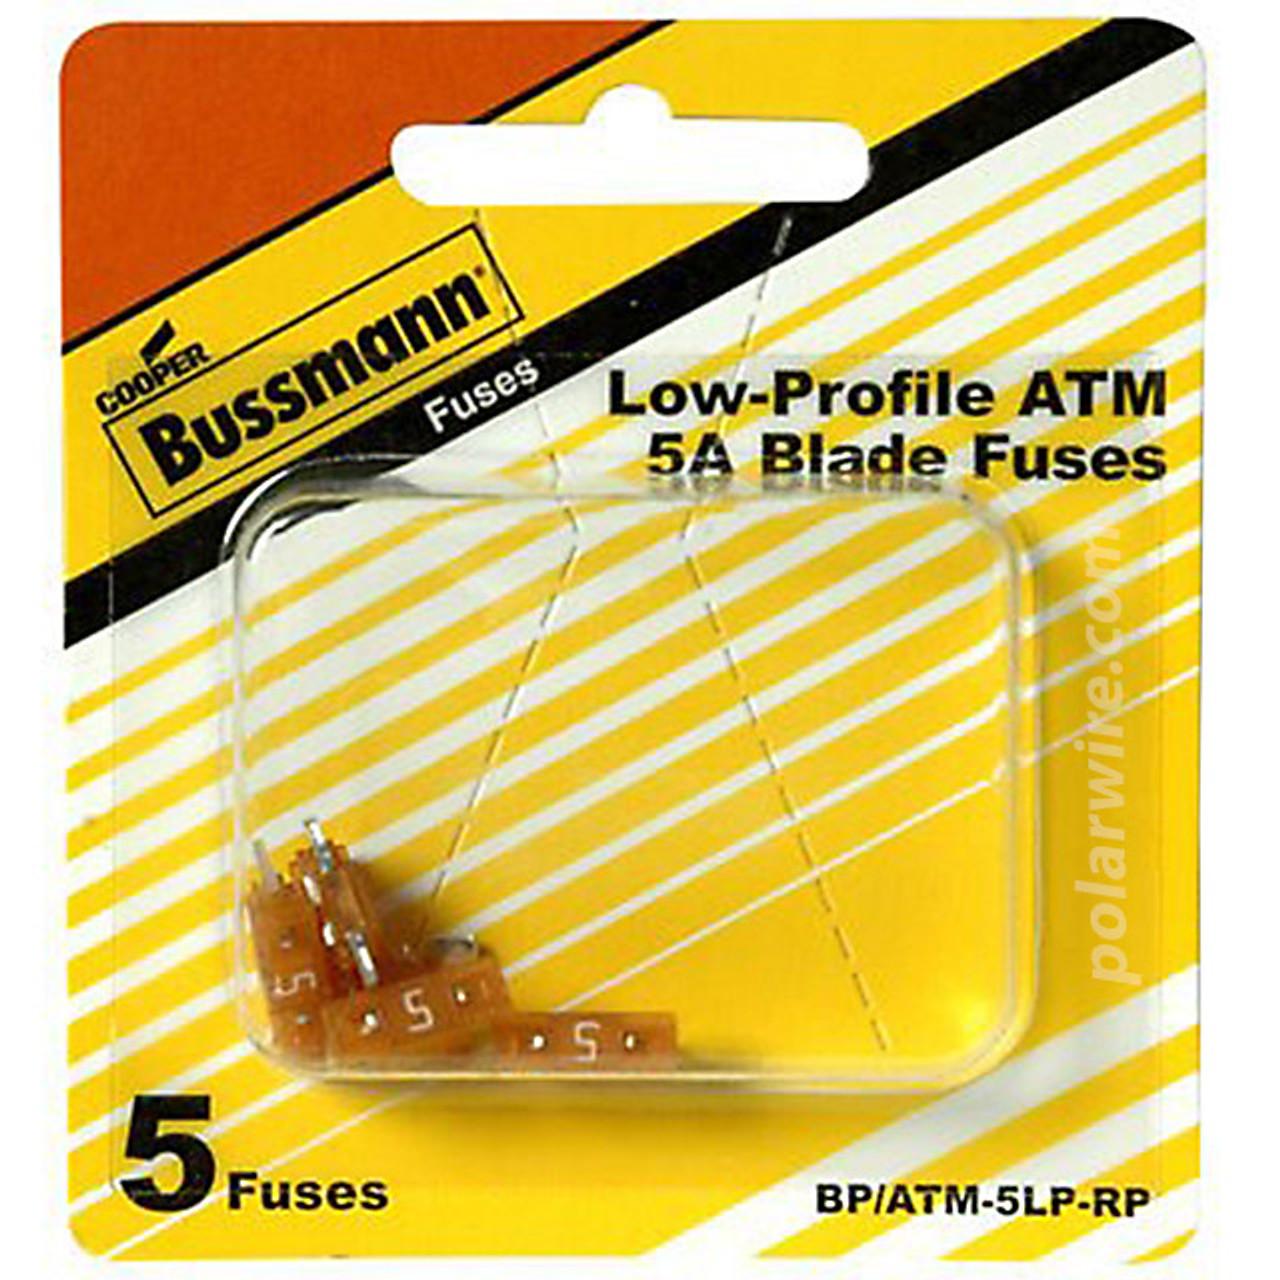 FUSE 5 AMP LOW PROFILE ATM MINI-BLADE FUSE 5 PK